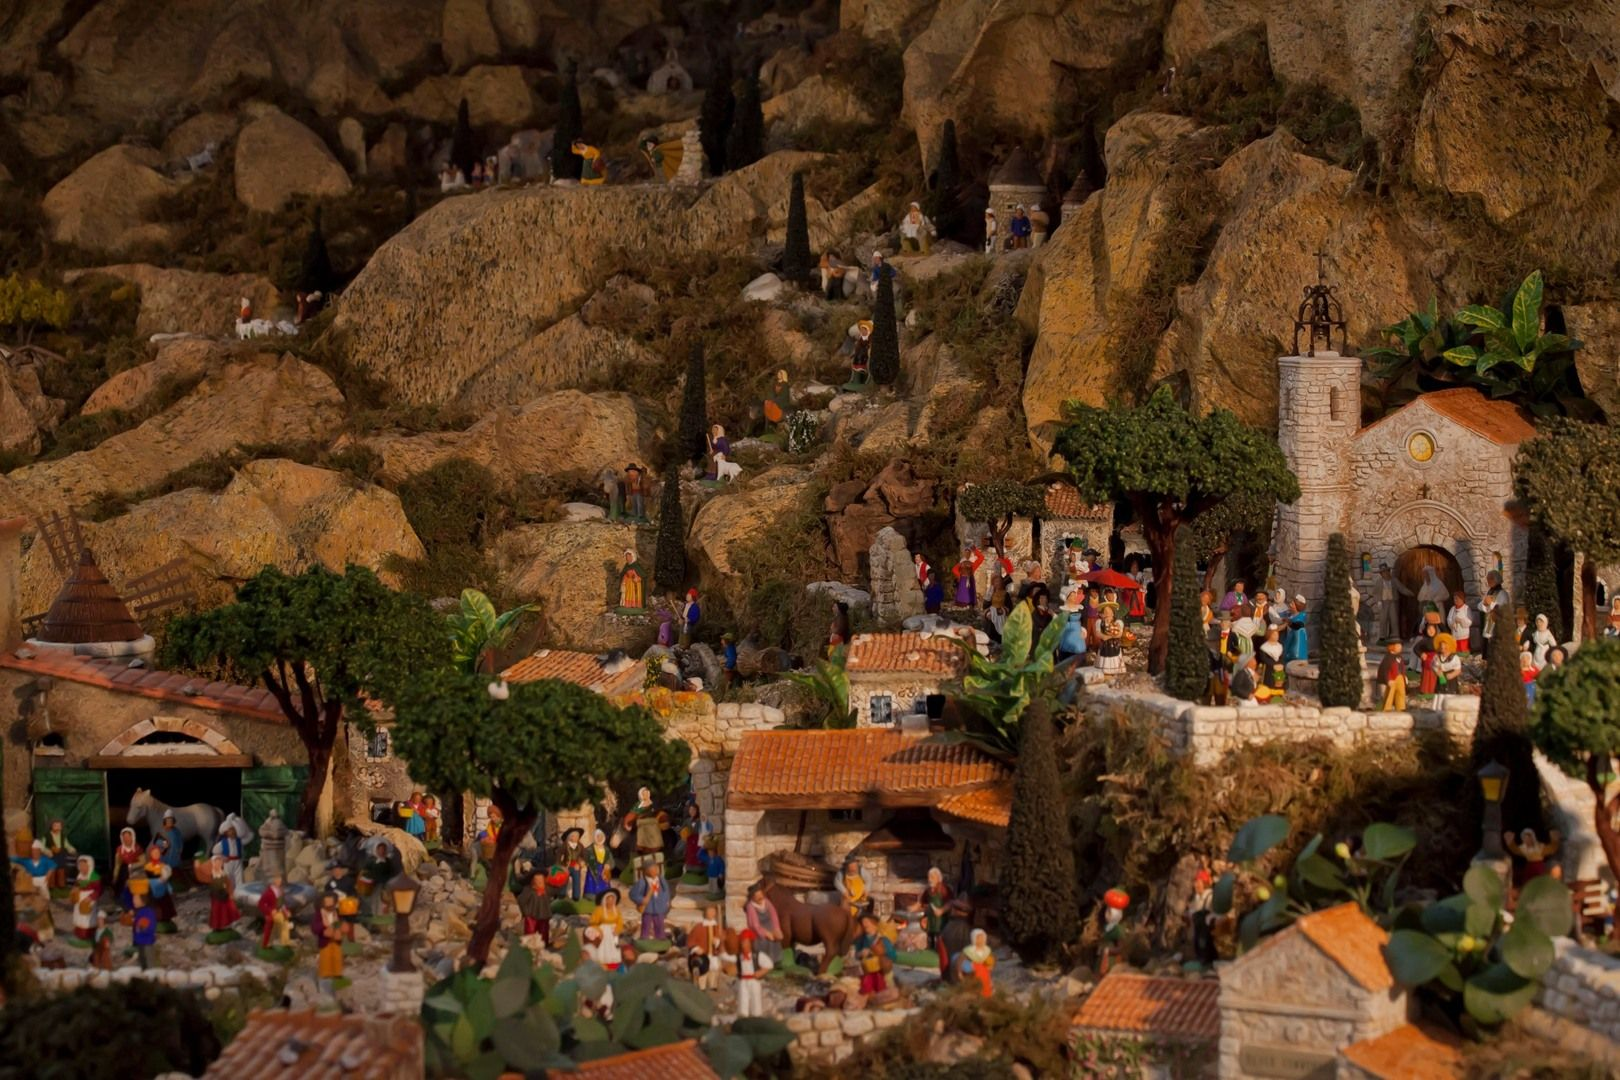 Provençal Nativity Scene at Saint François Xavier Church in Paris // PHOTO BY JACQUES BRAVO /// Merry Christmas to all! ///